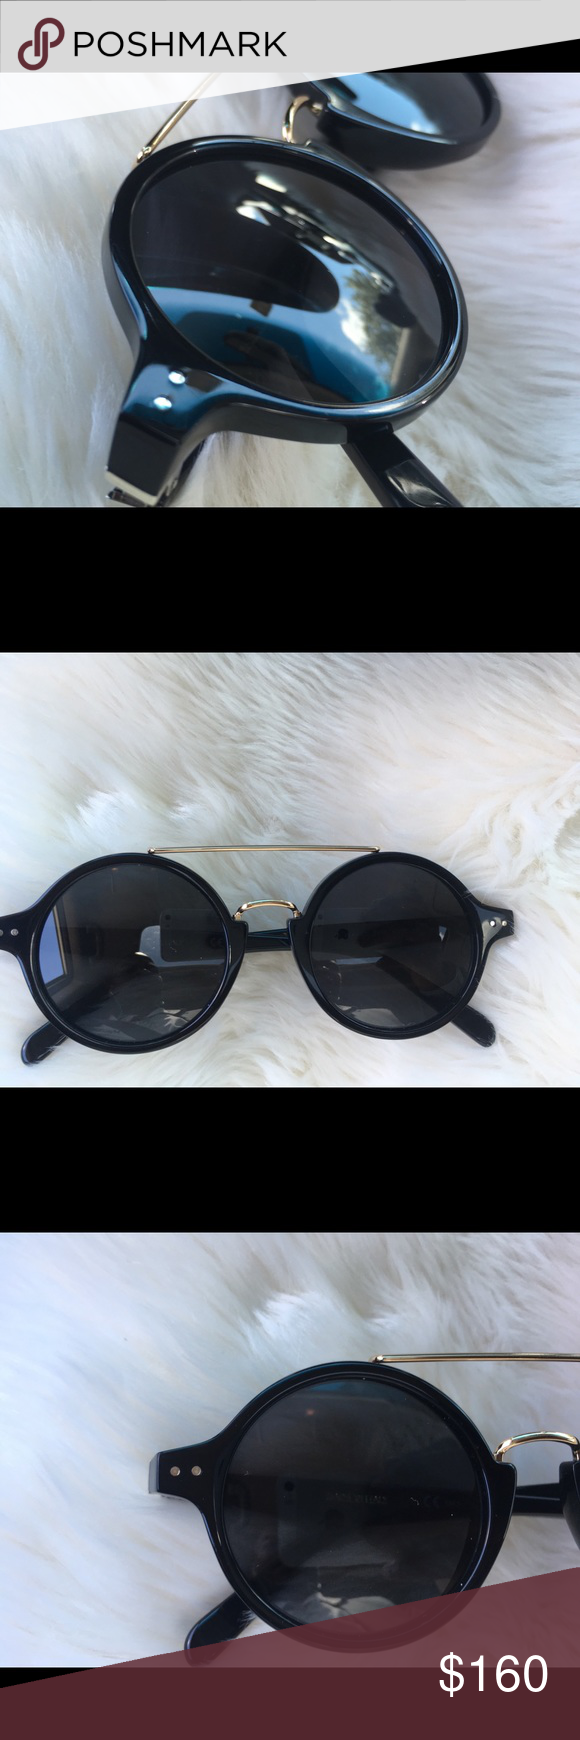 "b257f08e8f Celine Eyeglasses""Thin Ella"" Collection  2018 Reference  CL-41436 - 807 IR  Model  Women Frame material  Acetate Frame colour  Black and gold Lenses   Celine ..."